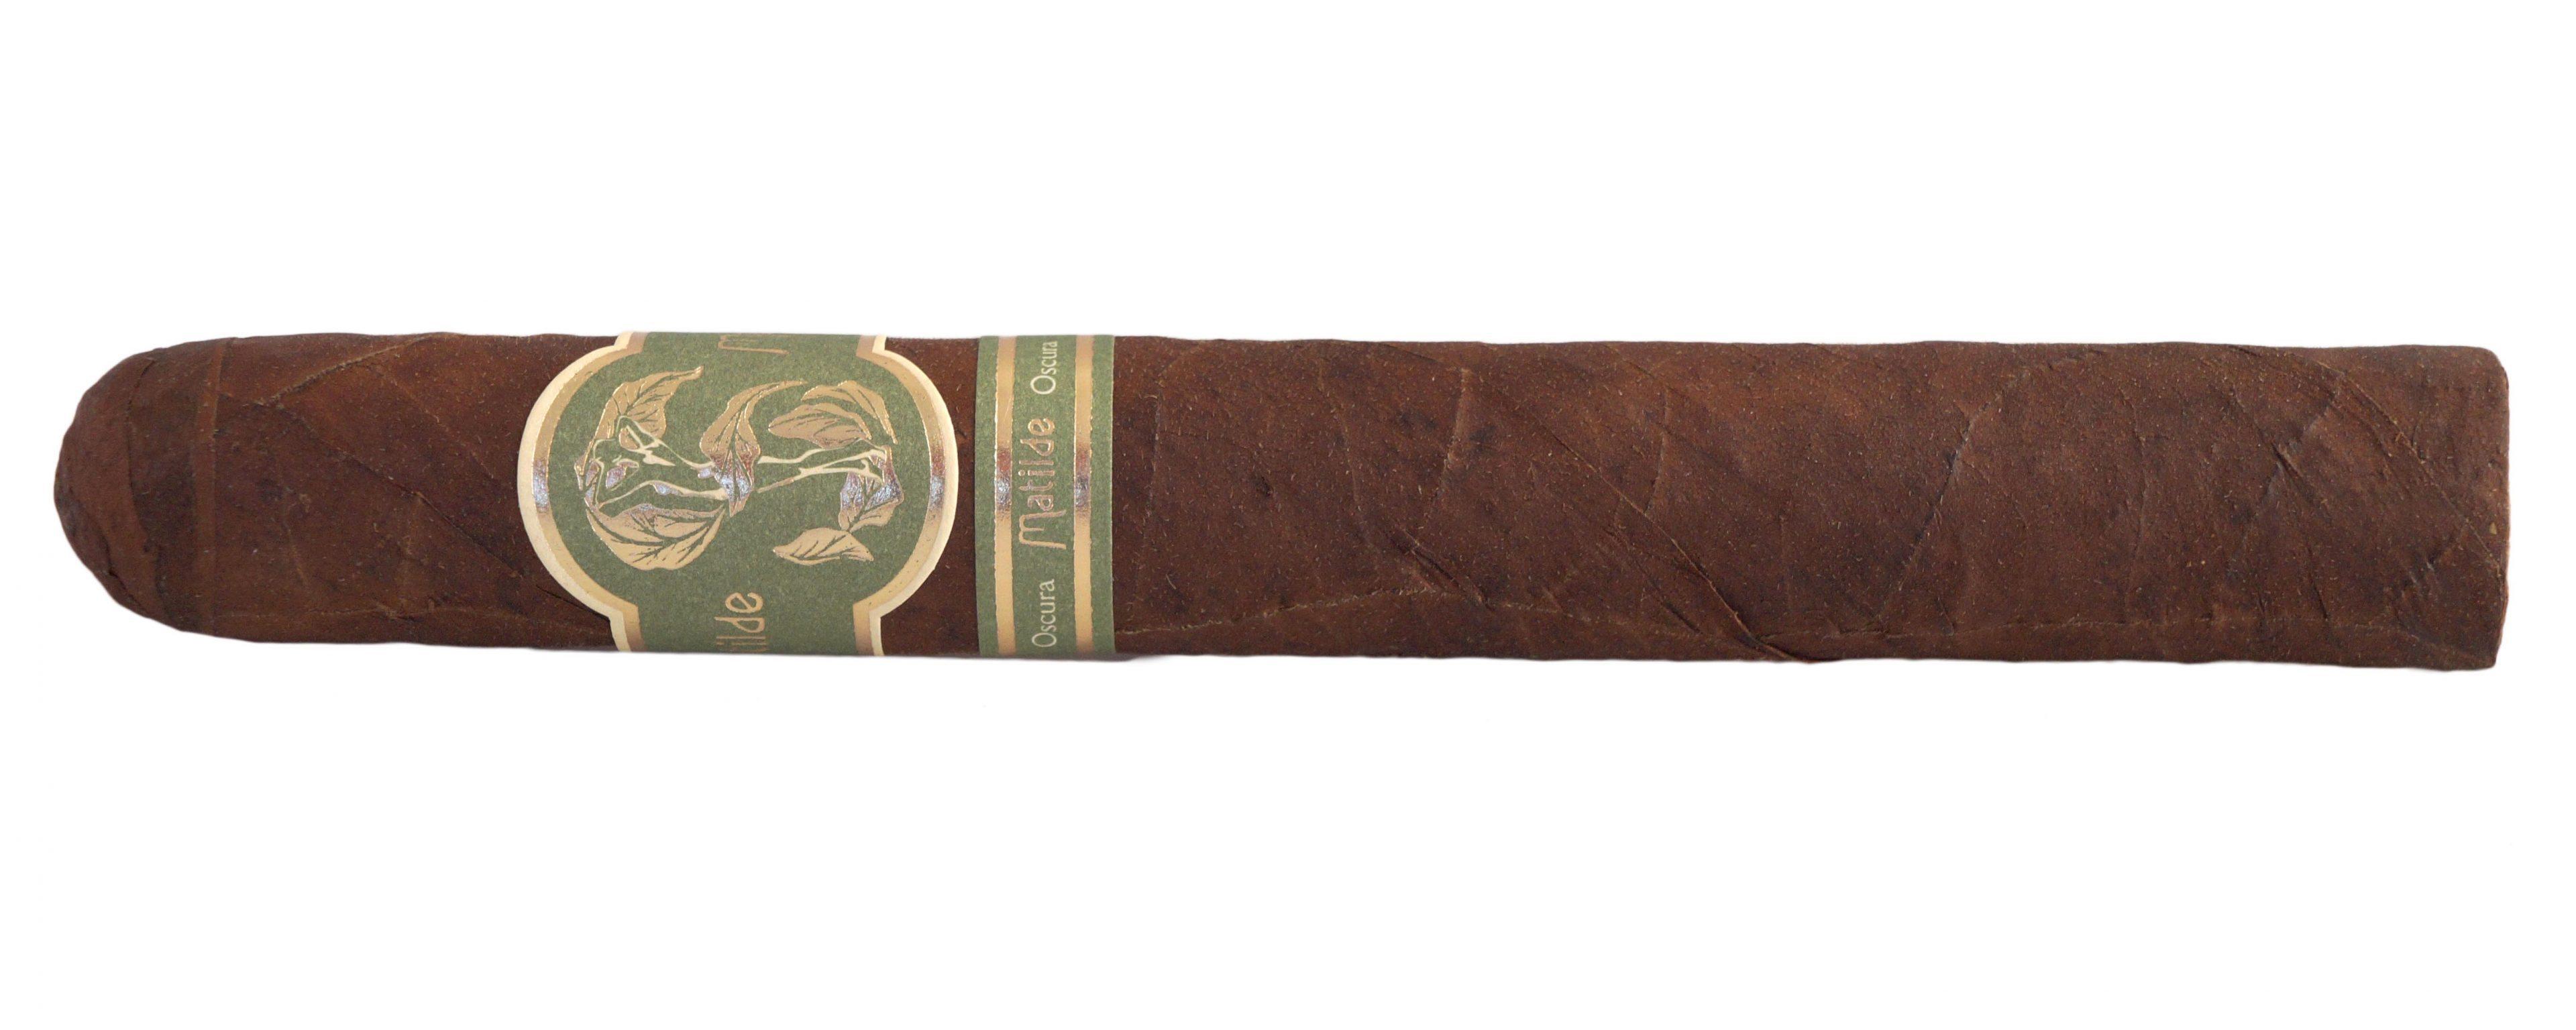 Blind Cigar Review: Matilde | Oscura Toro Bravo